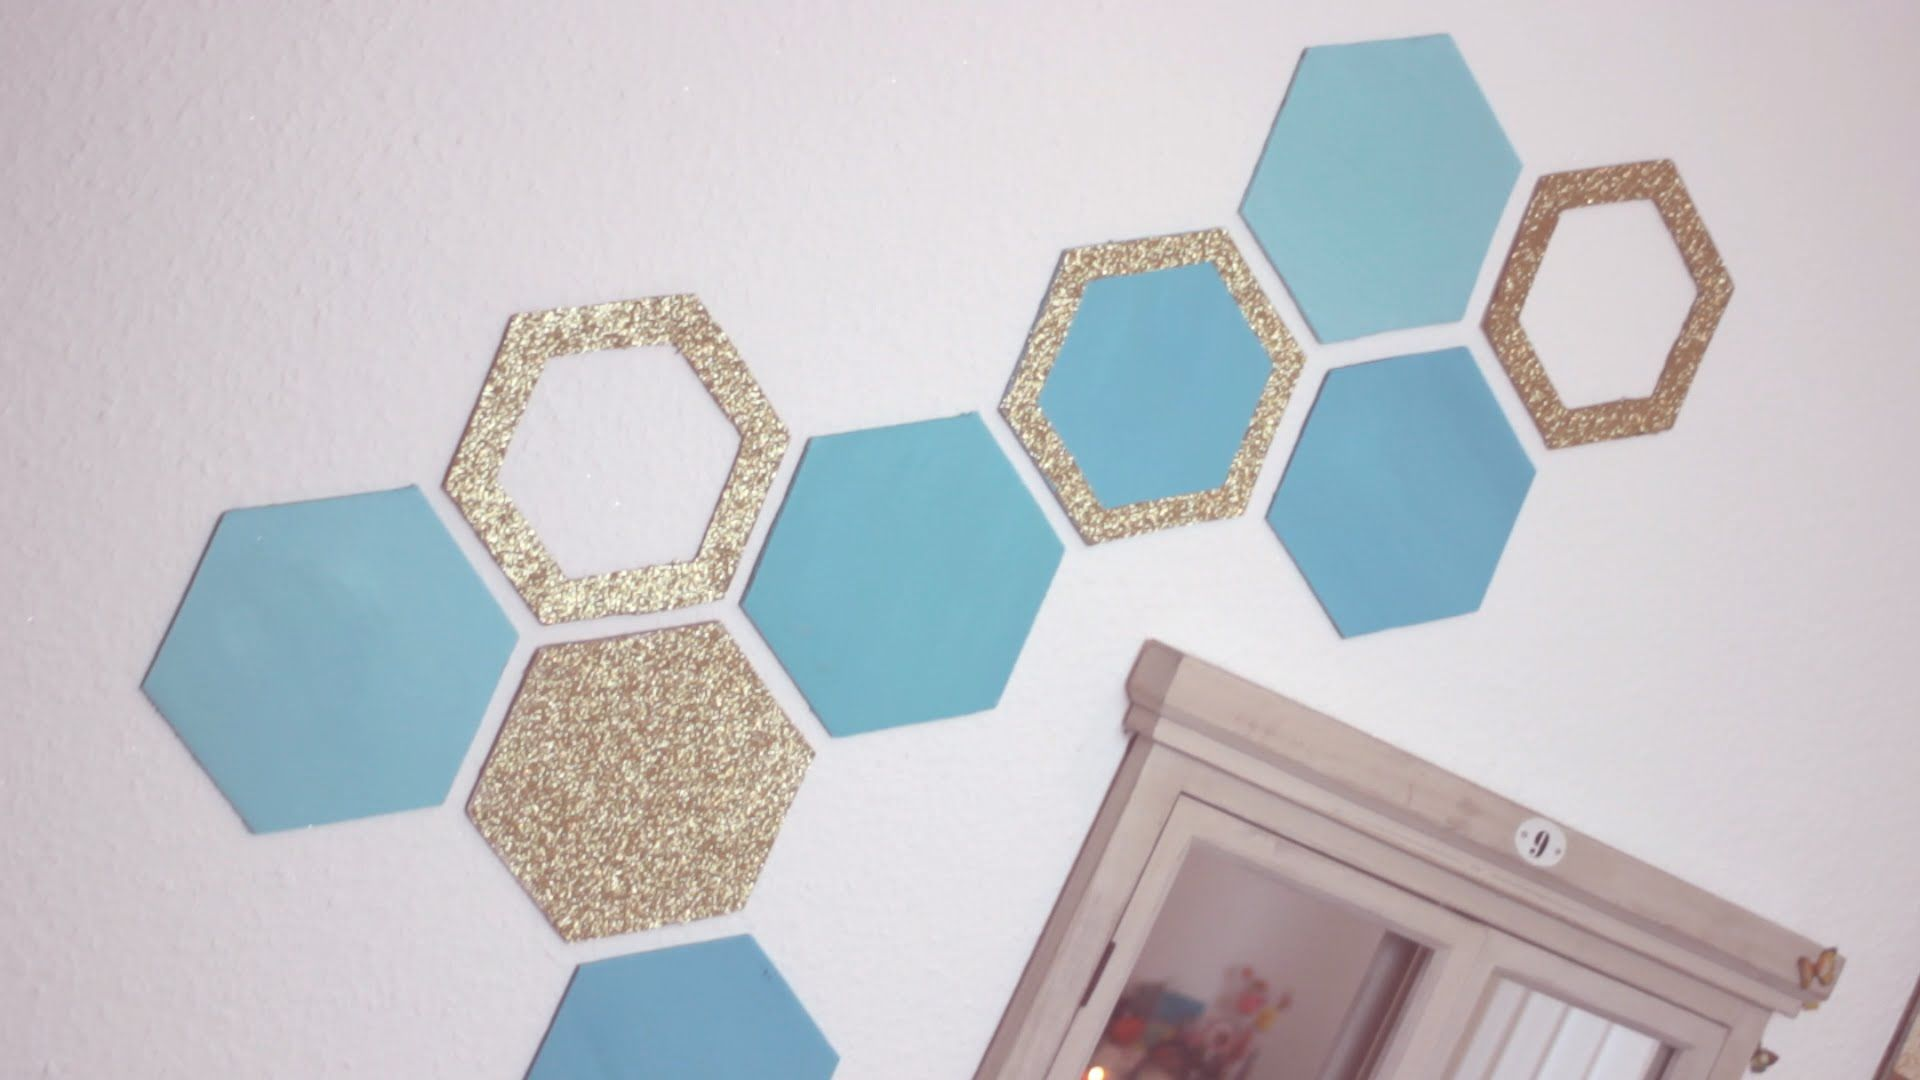 Diy honeycomb wall decor easy recycling home decor idea home